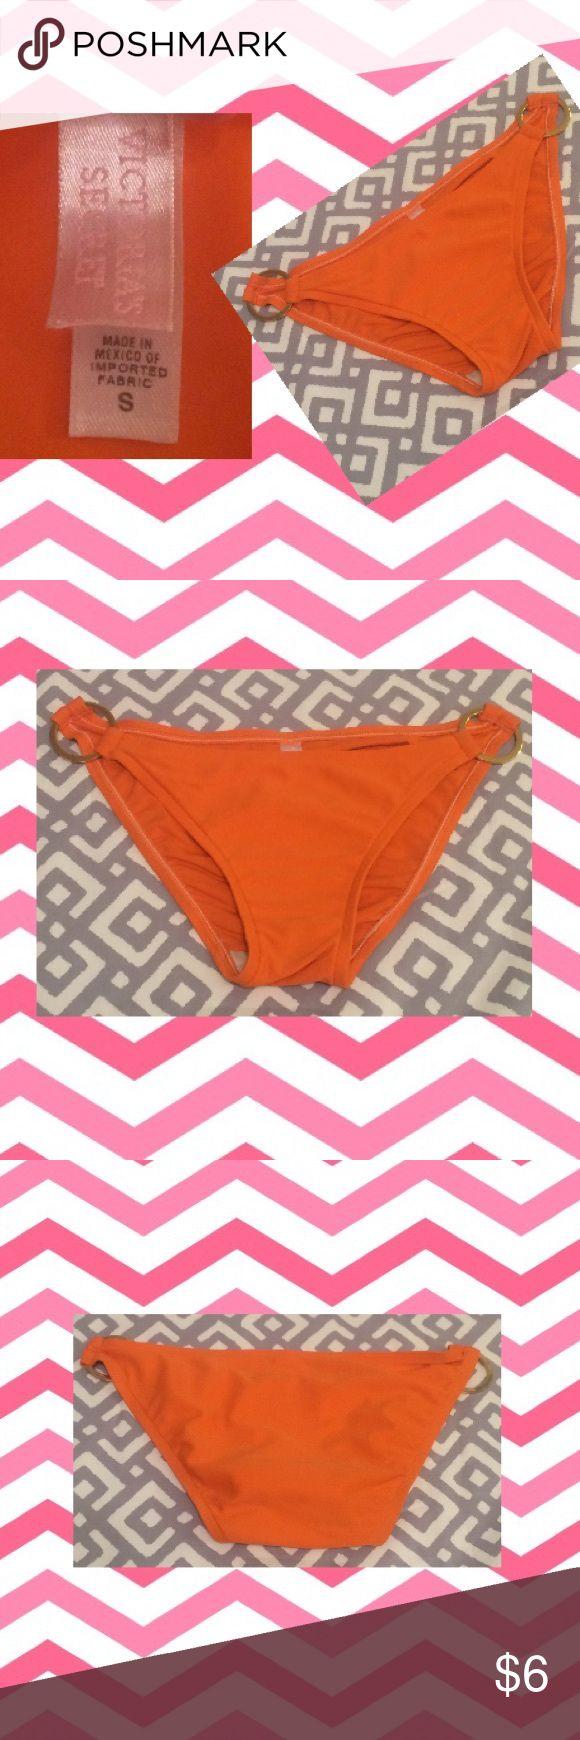 VS, small orange bikini bottom Small orange bikini bottom with gold rings on the sides. Victoria's Secret Swim Bikinis